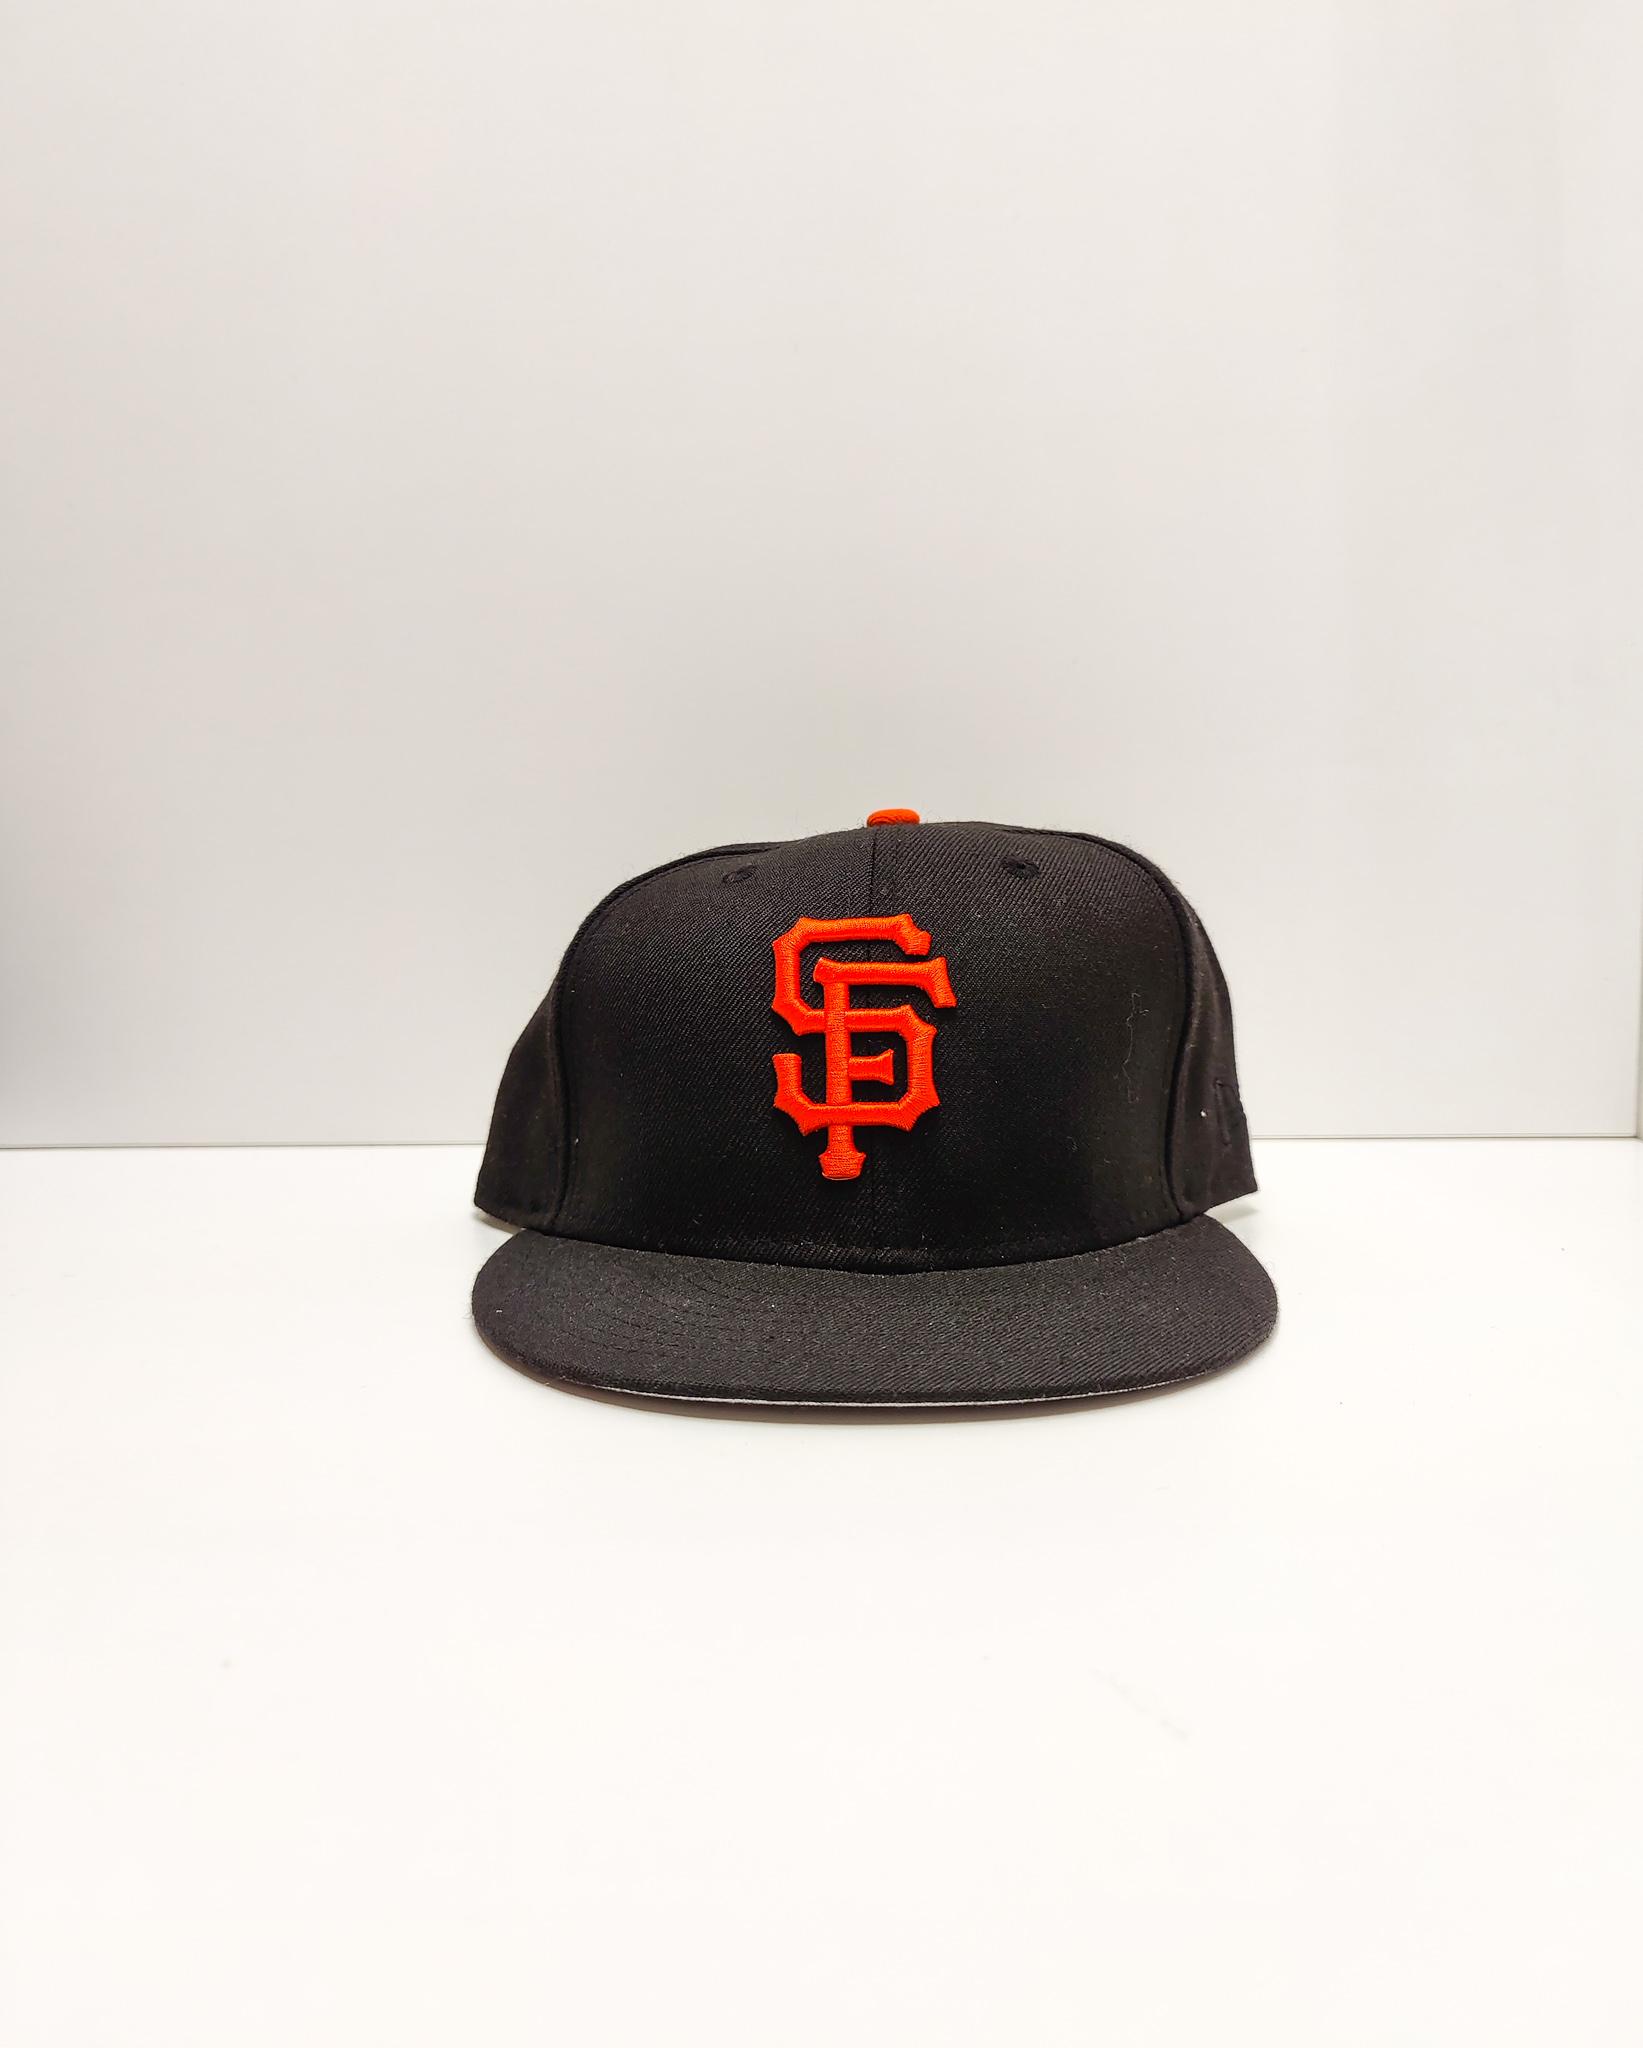 New Era 59Fifty Heritage Series San Francisco Giants